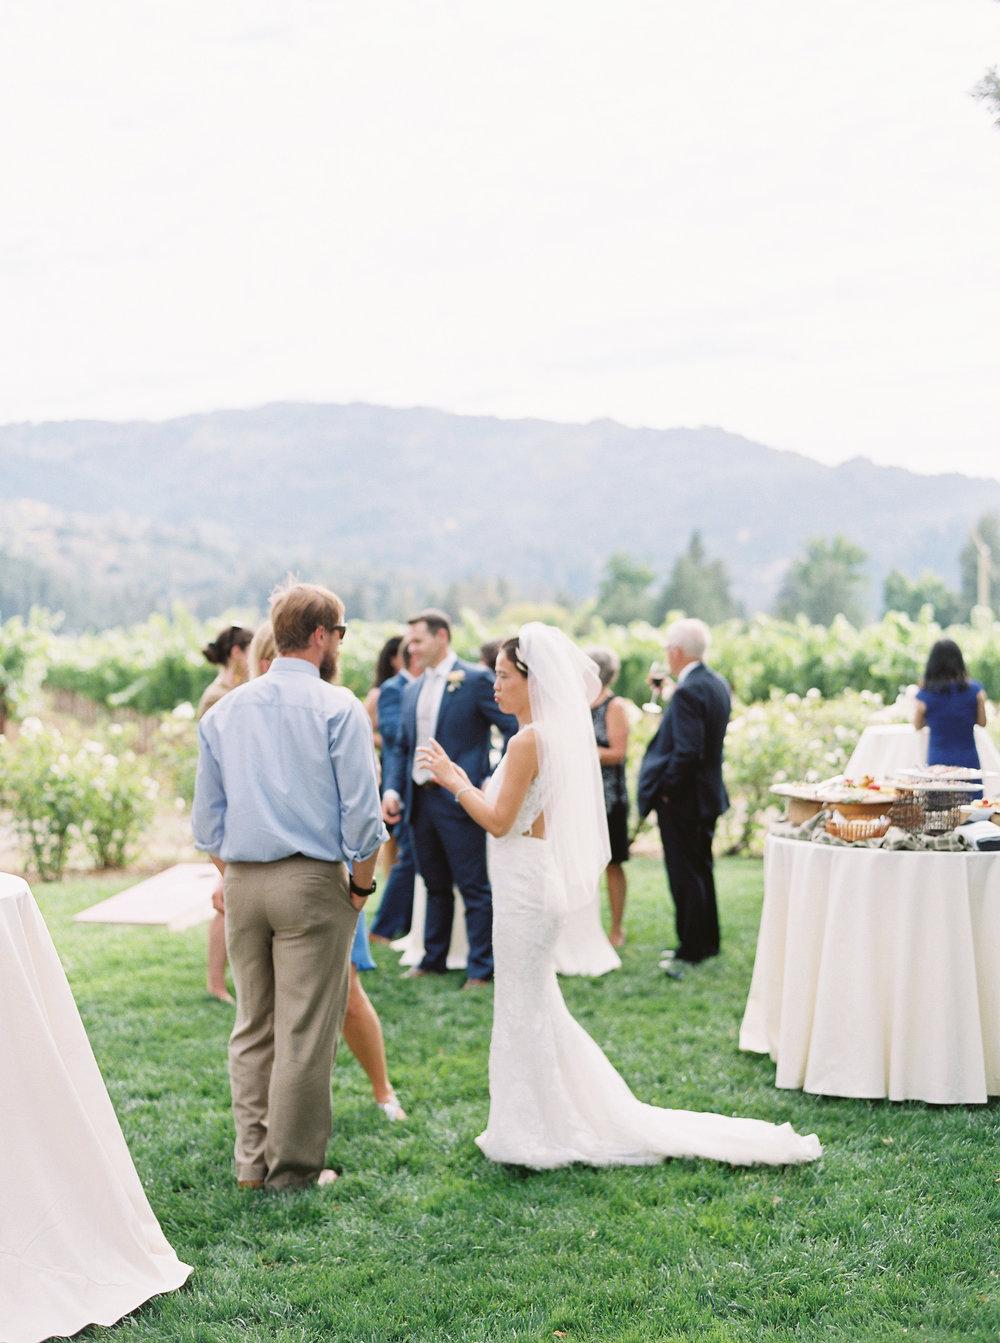 Harvest-inn-wedding-in-napa-california-185.jpg